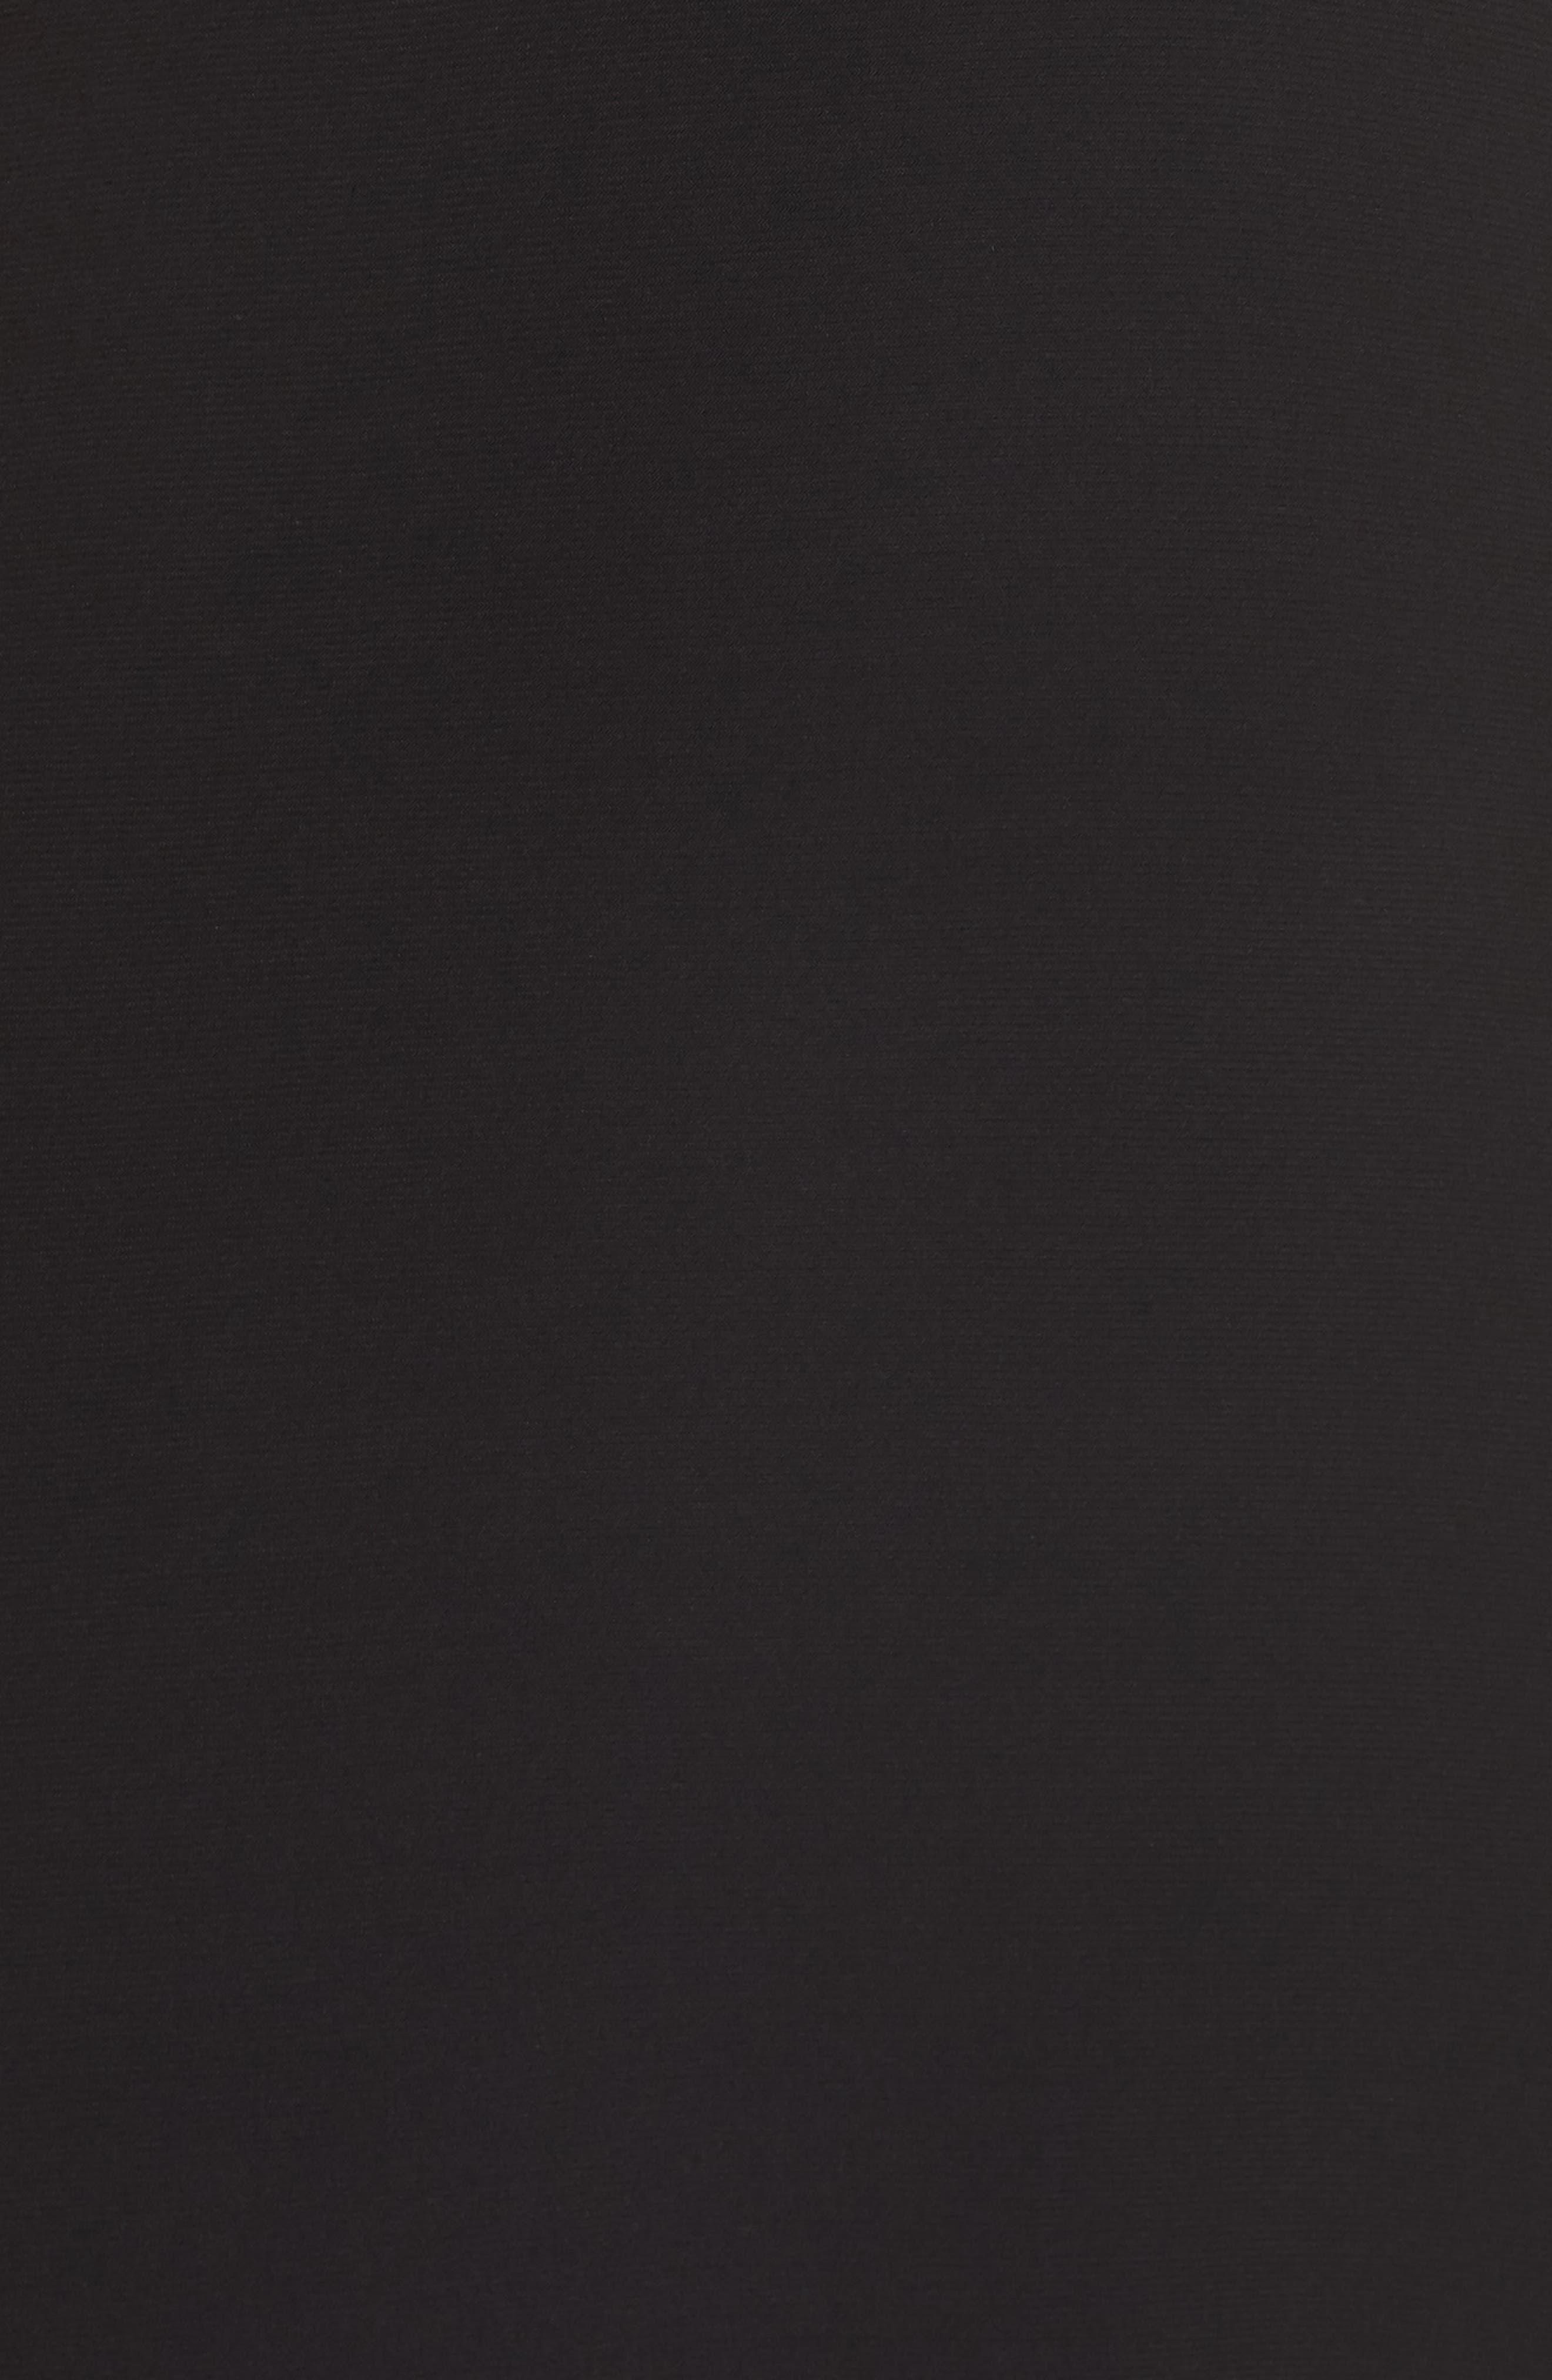 MORGAN & CO.,                             Lace & Illusion Mesh Bodice Gown,                             Alternate thumbnail 6, color,                             BLACK/ NUDE